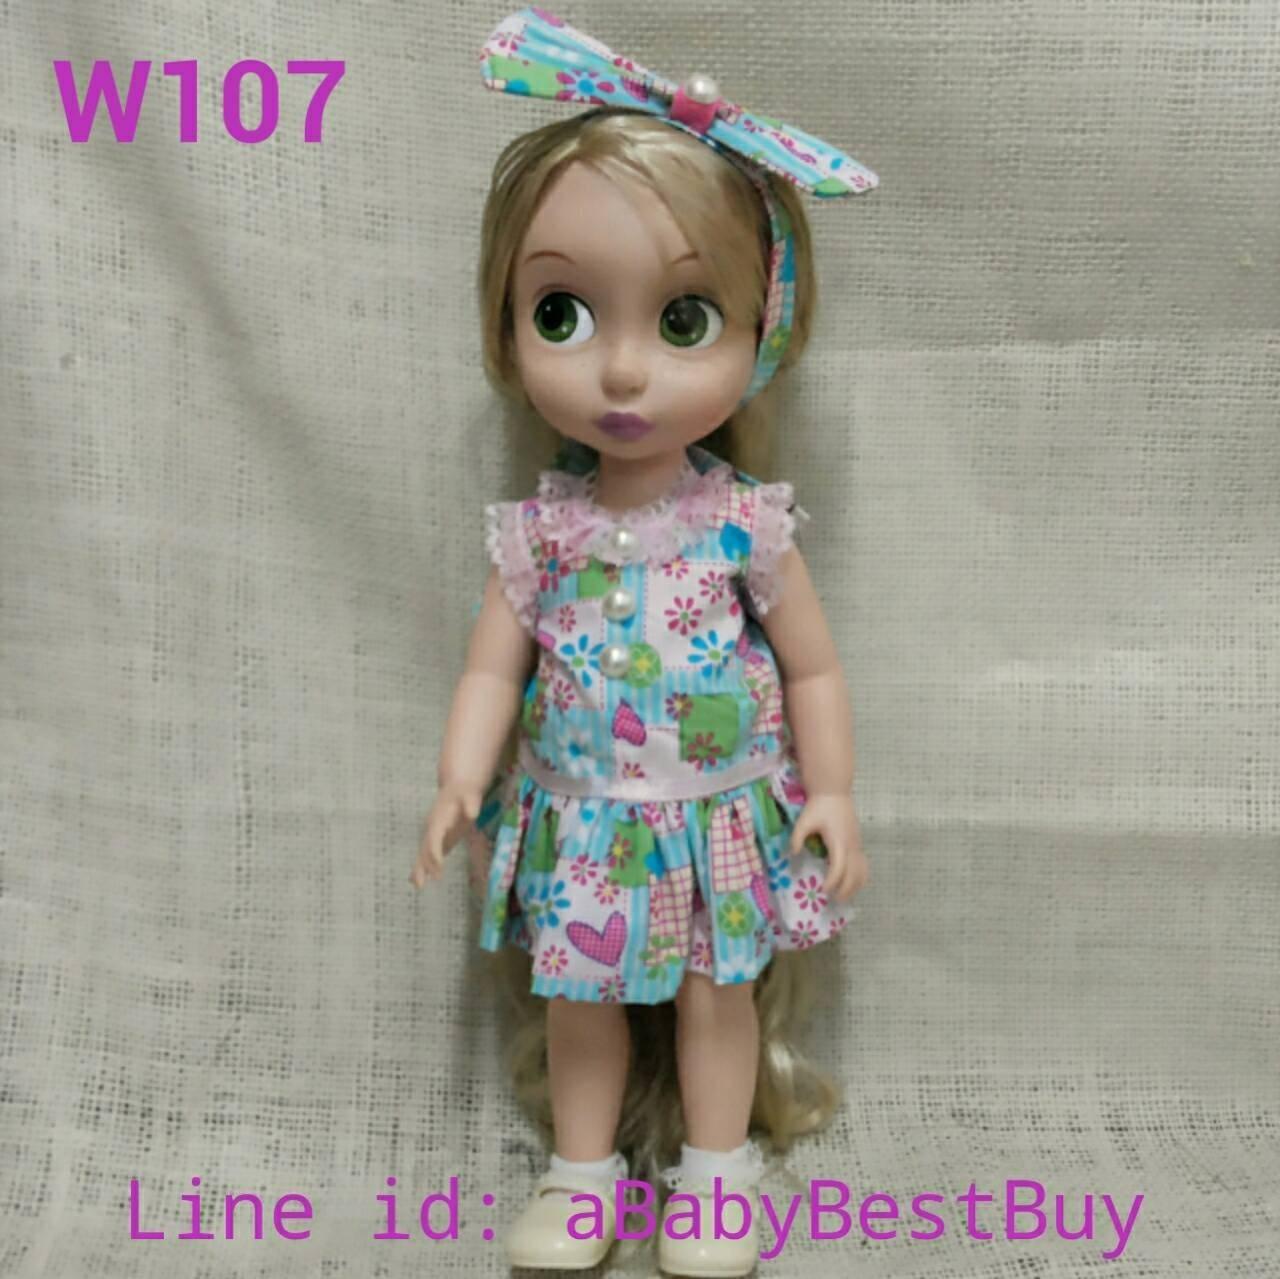 z W107 เสื้อผ้าตุ๊กตา- Disney Animators' Collection Doll - 16'' (พร้อมส่ง)